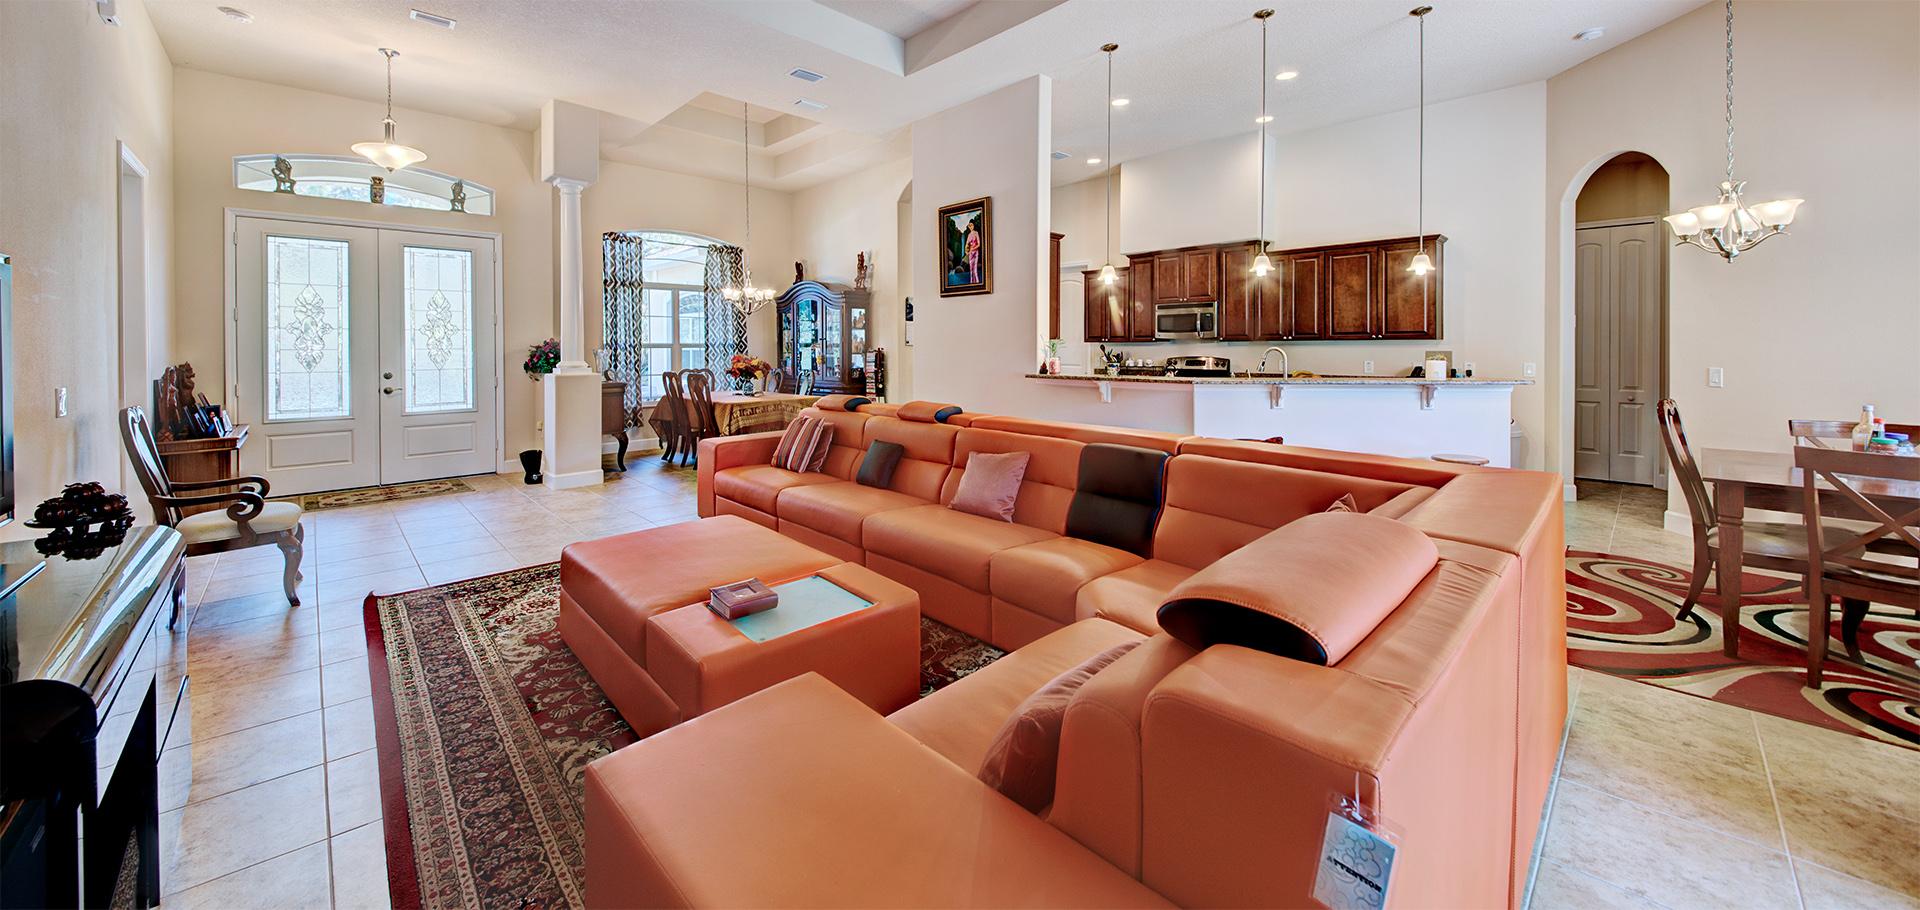 House-Building-Palm Bay FL